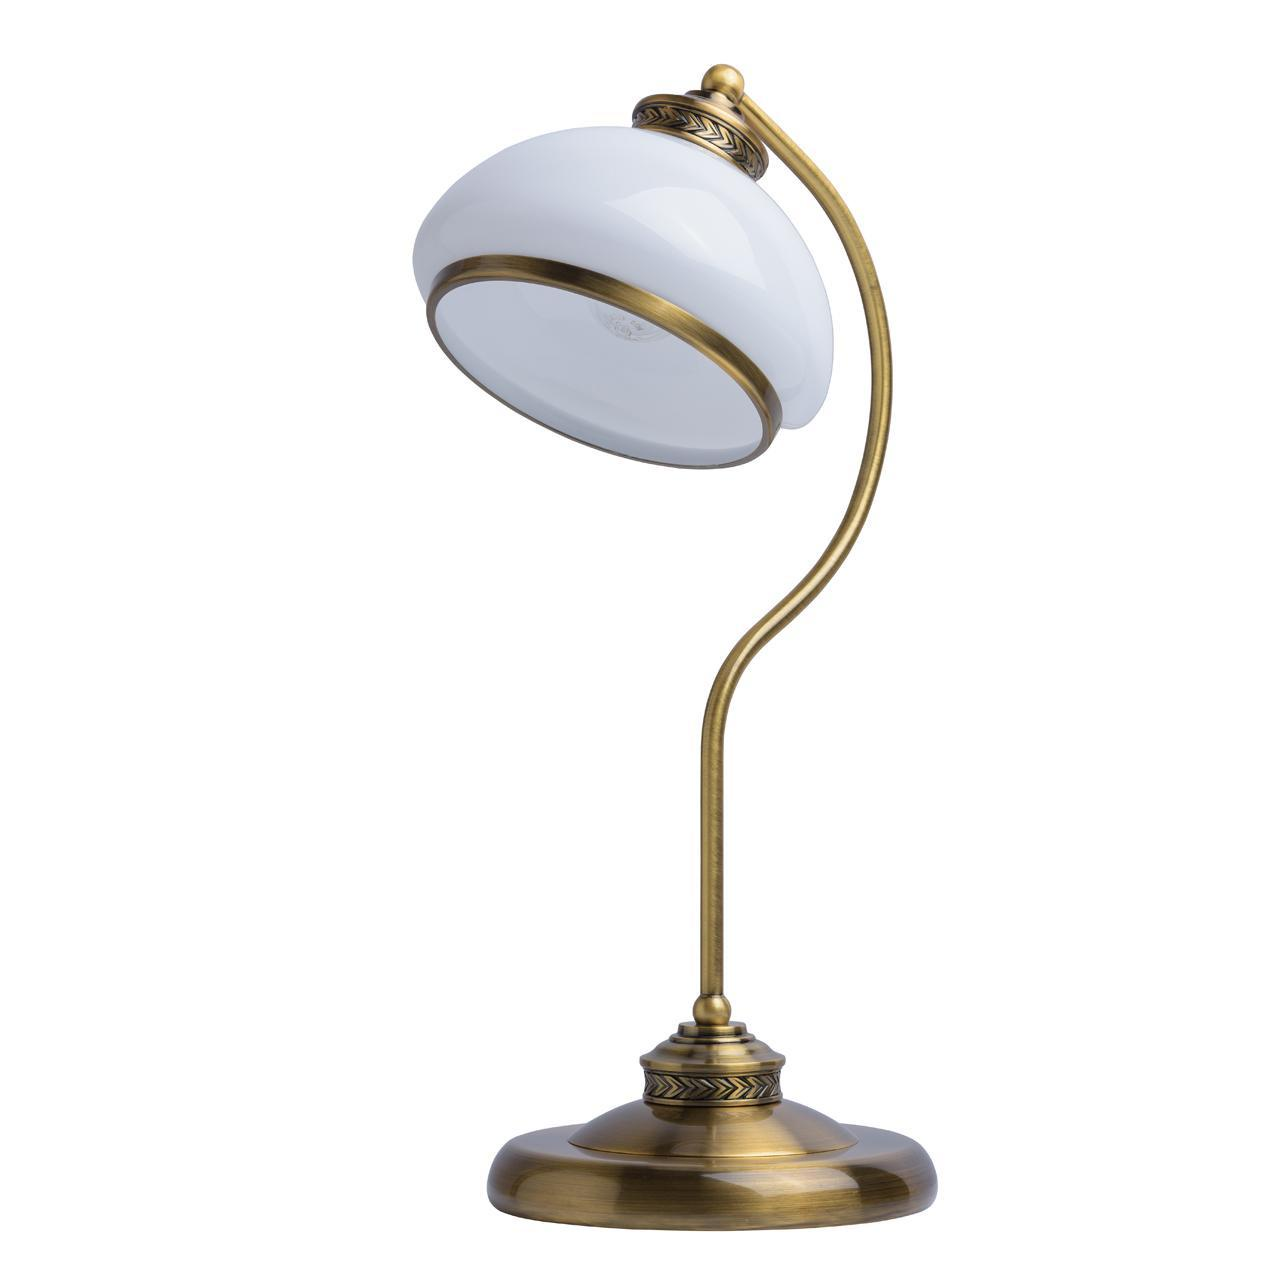 Настольный светильник Chiaro 481031301, E27, 60 Вт chiaro ch 355022502